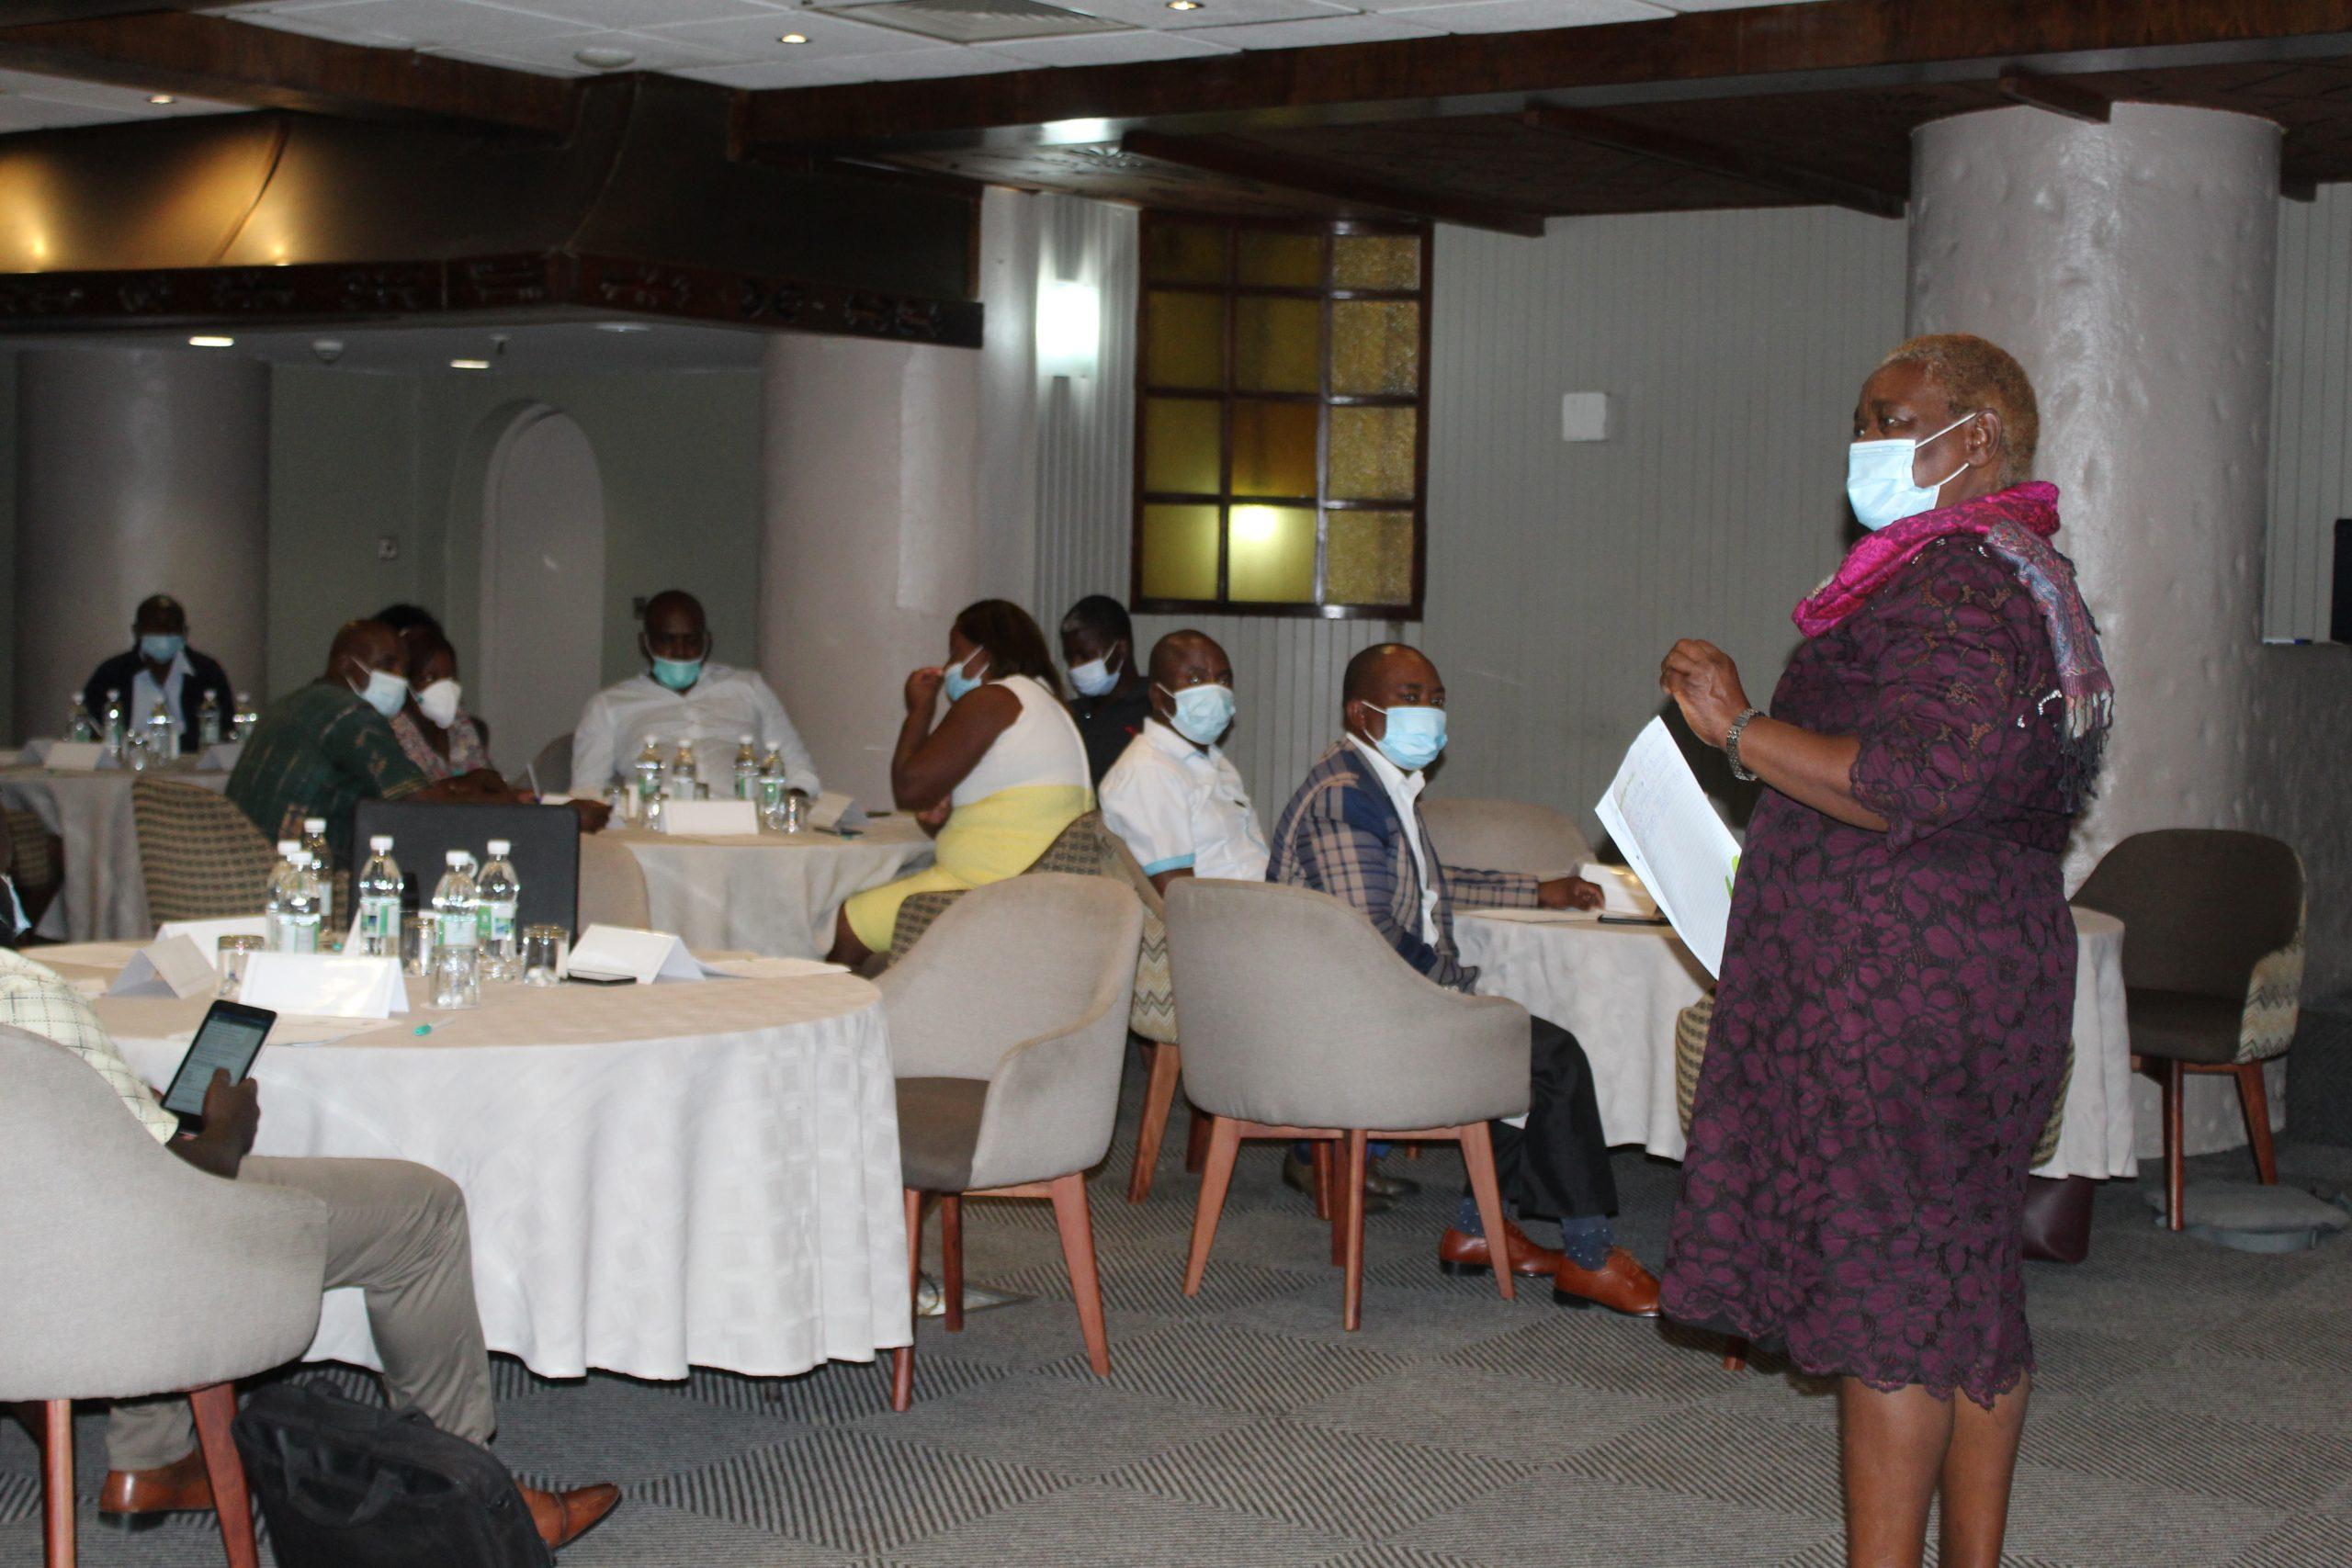 WAG Executive Director Mrs Edinah Masiyiwa addresses the Zim Nurses Association at the sensitisation meeting